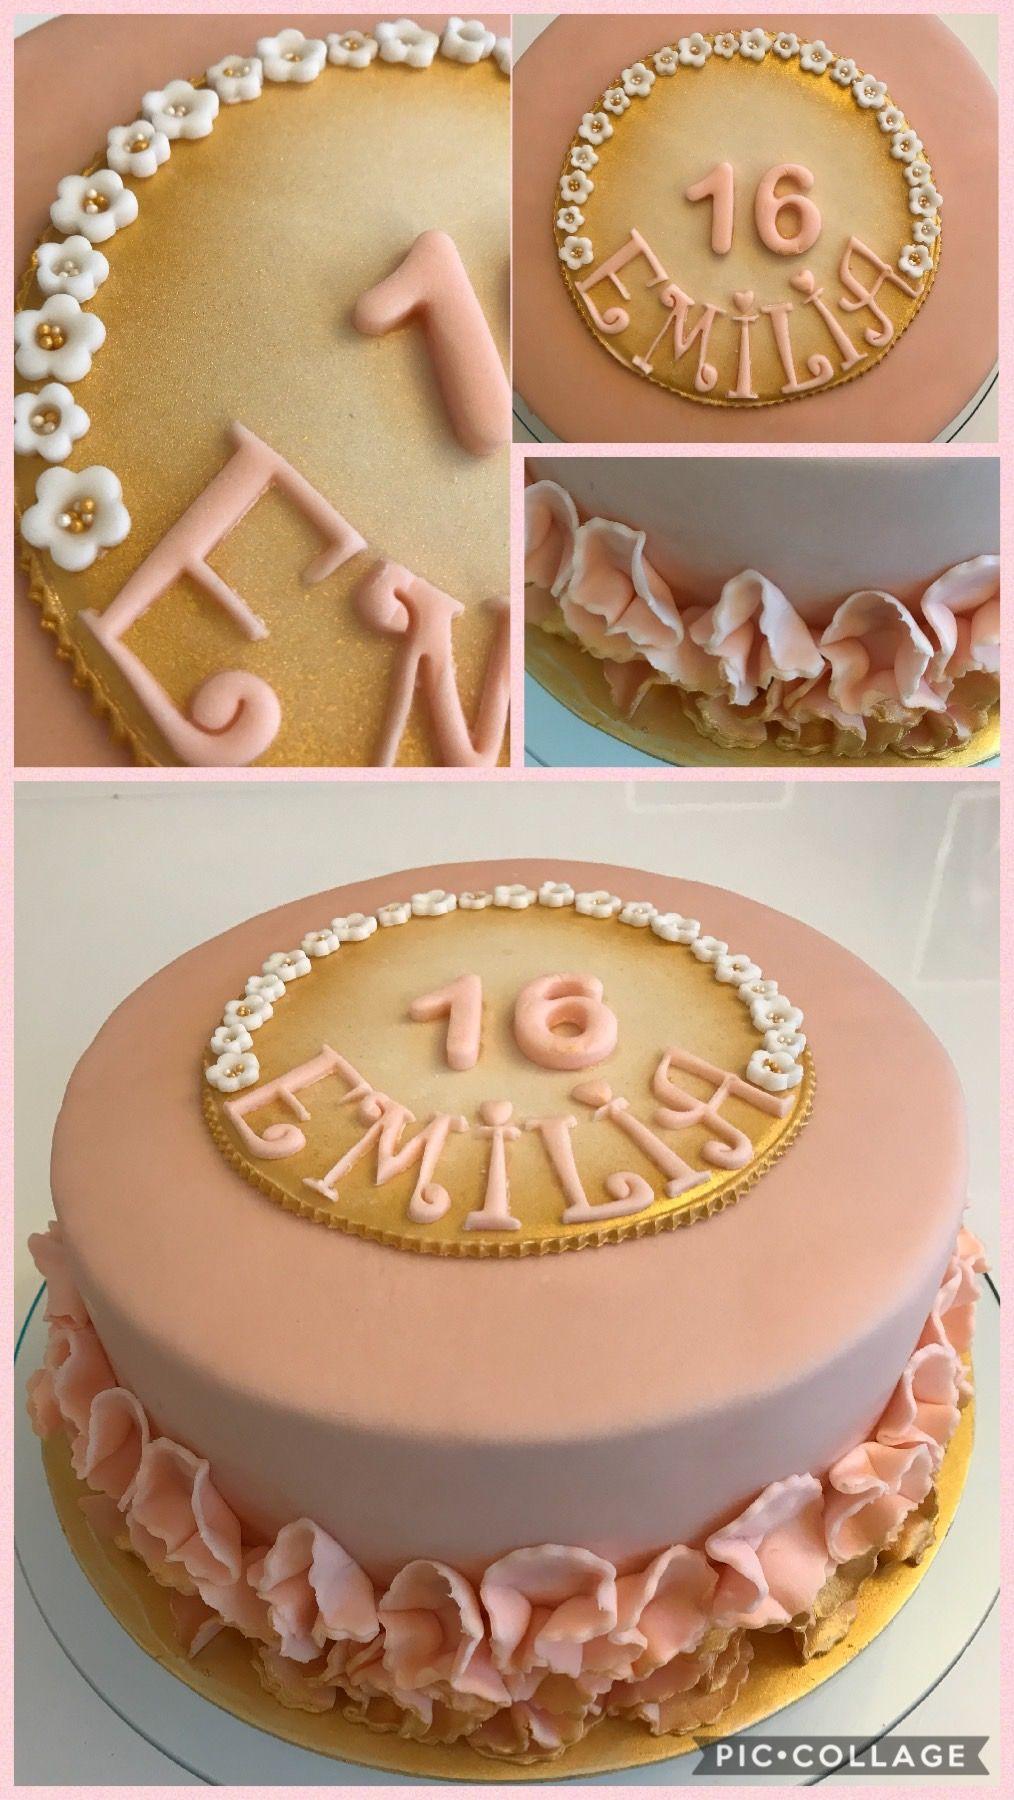 Birthdaycake Fondant Cake 16thanniversarycake Girl 16